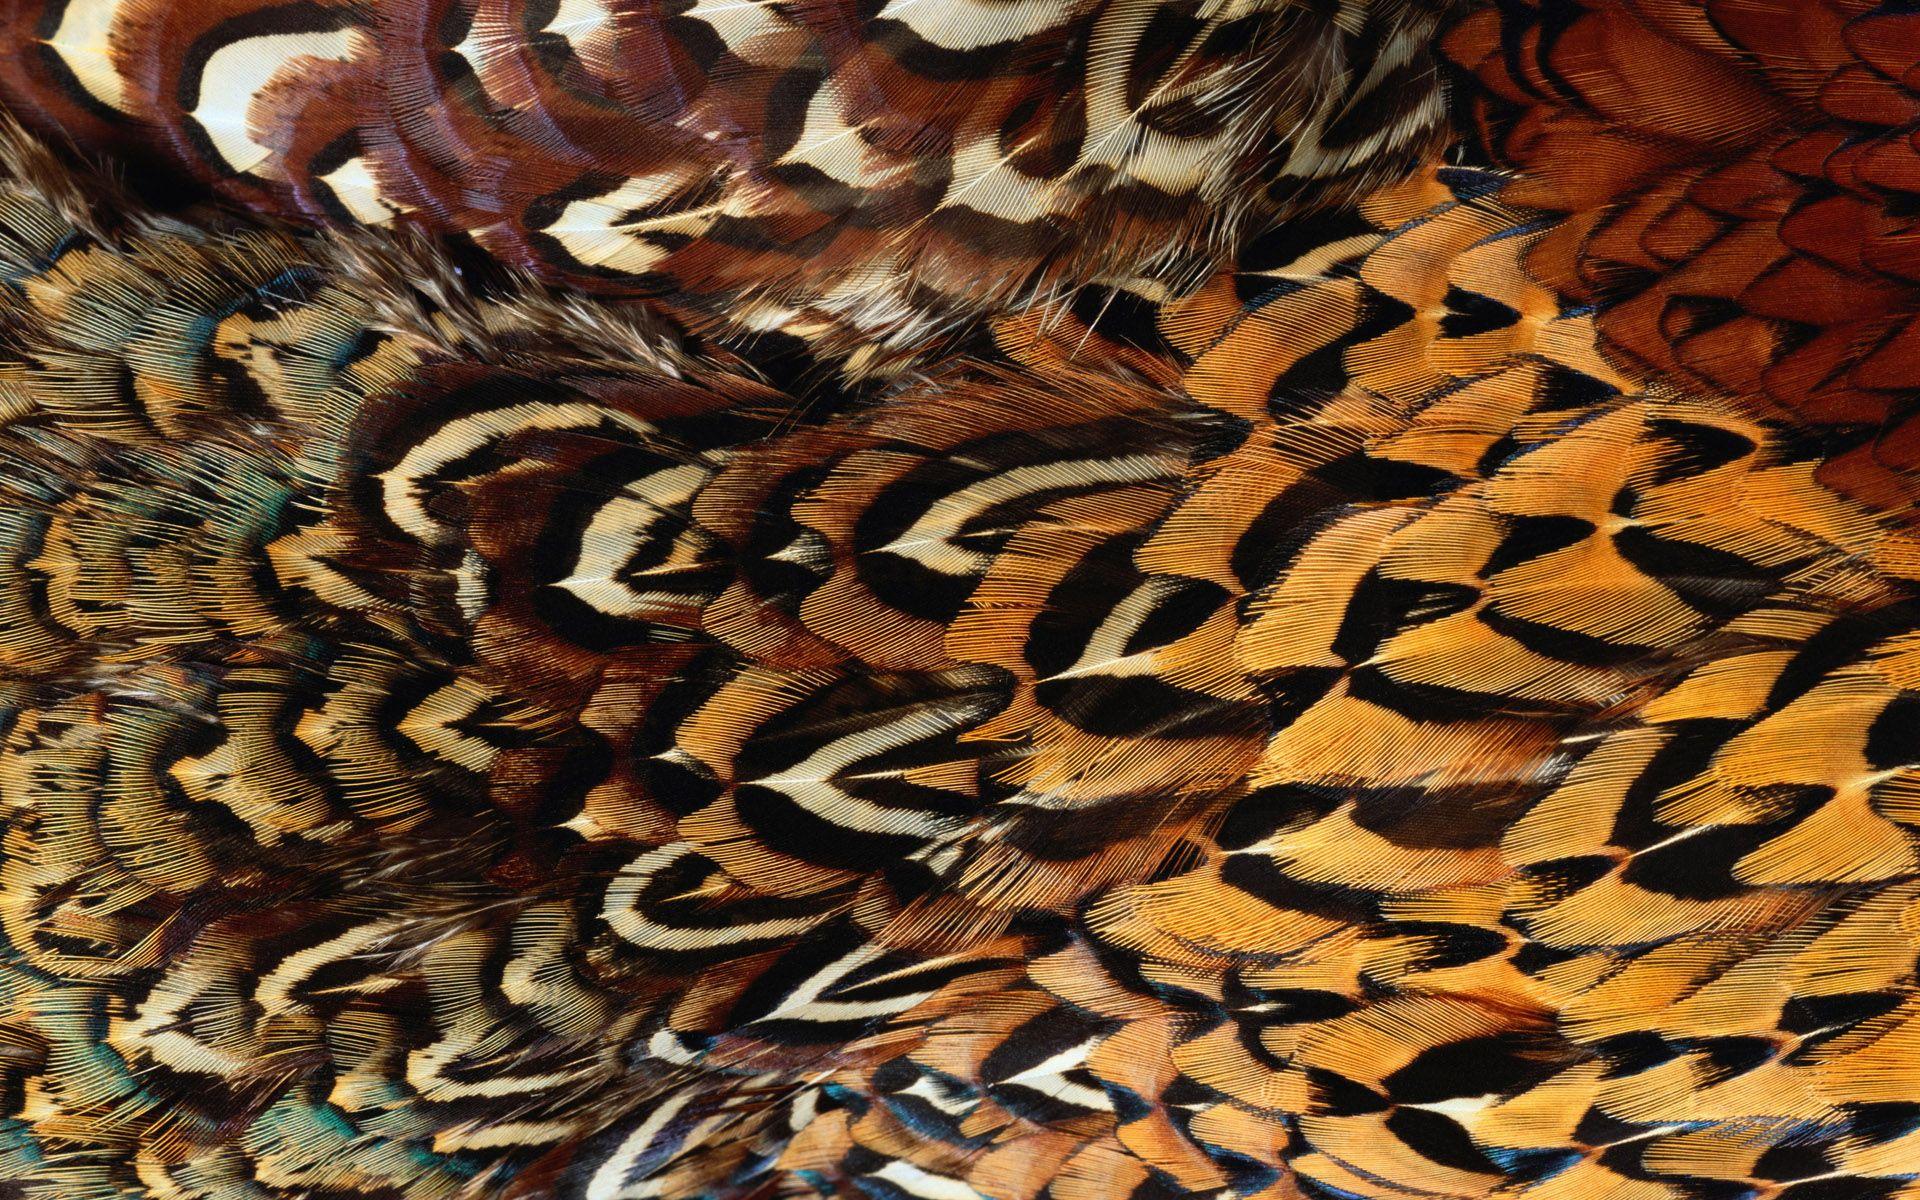 Animal fur texture Di Siji 9835 | motif transfert trace ...